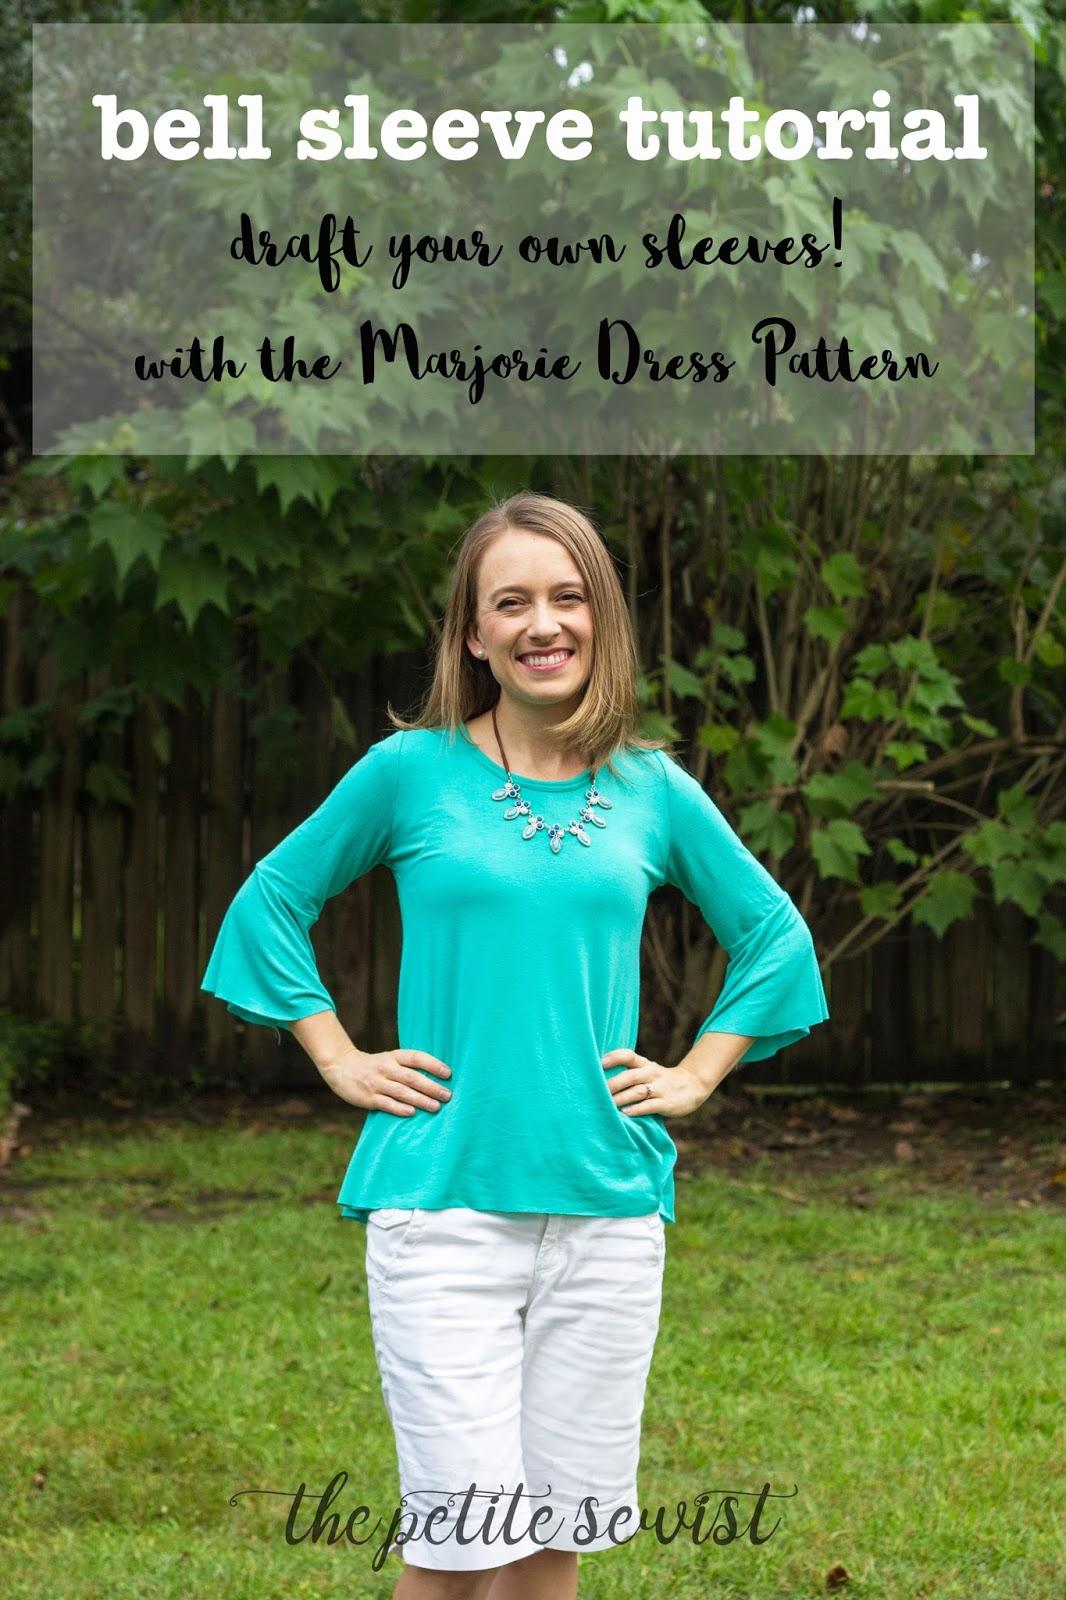 acdf7567306fd DIY Bell Sleeve Tutorial | The Marjorie Dress Pattern - The Petite ...